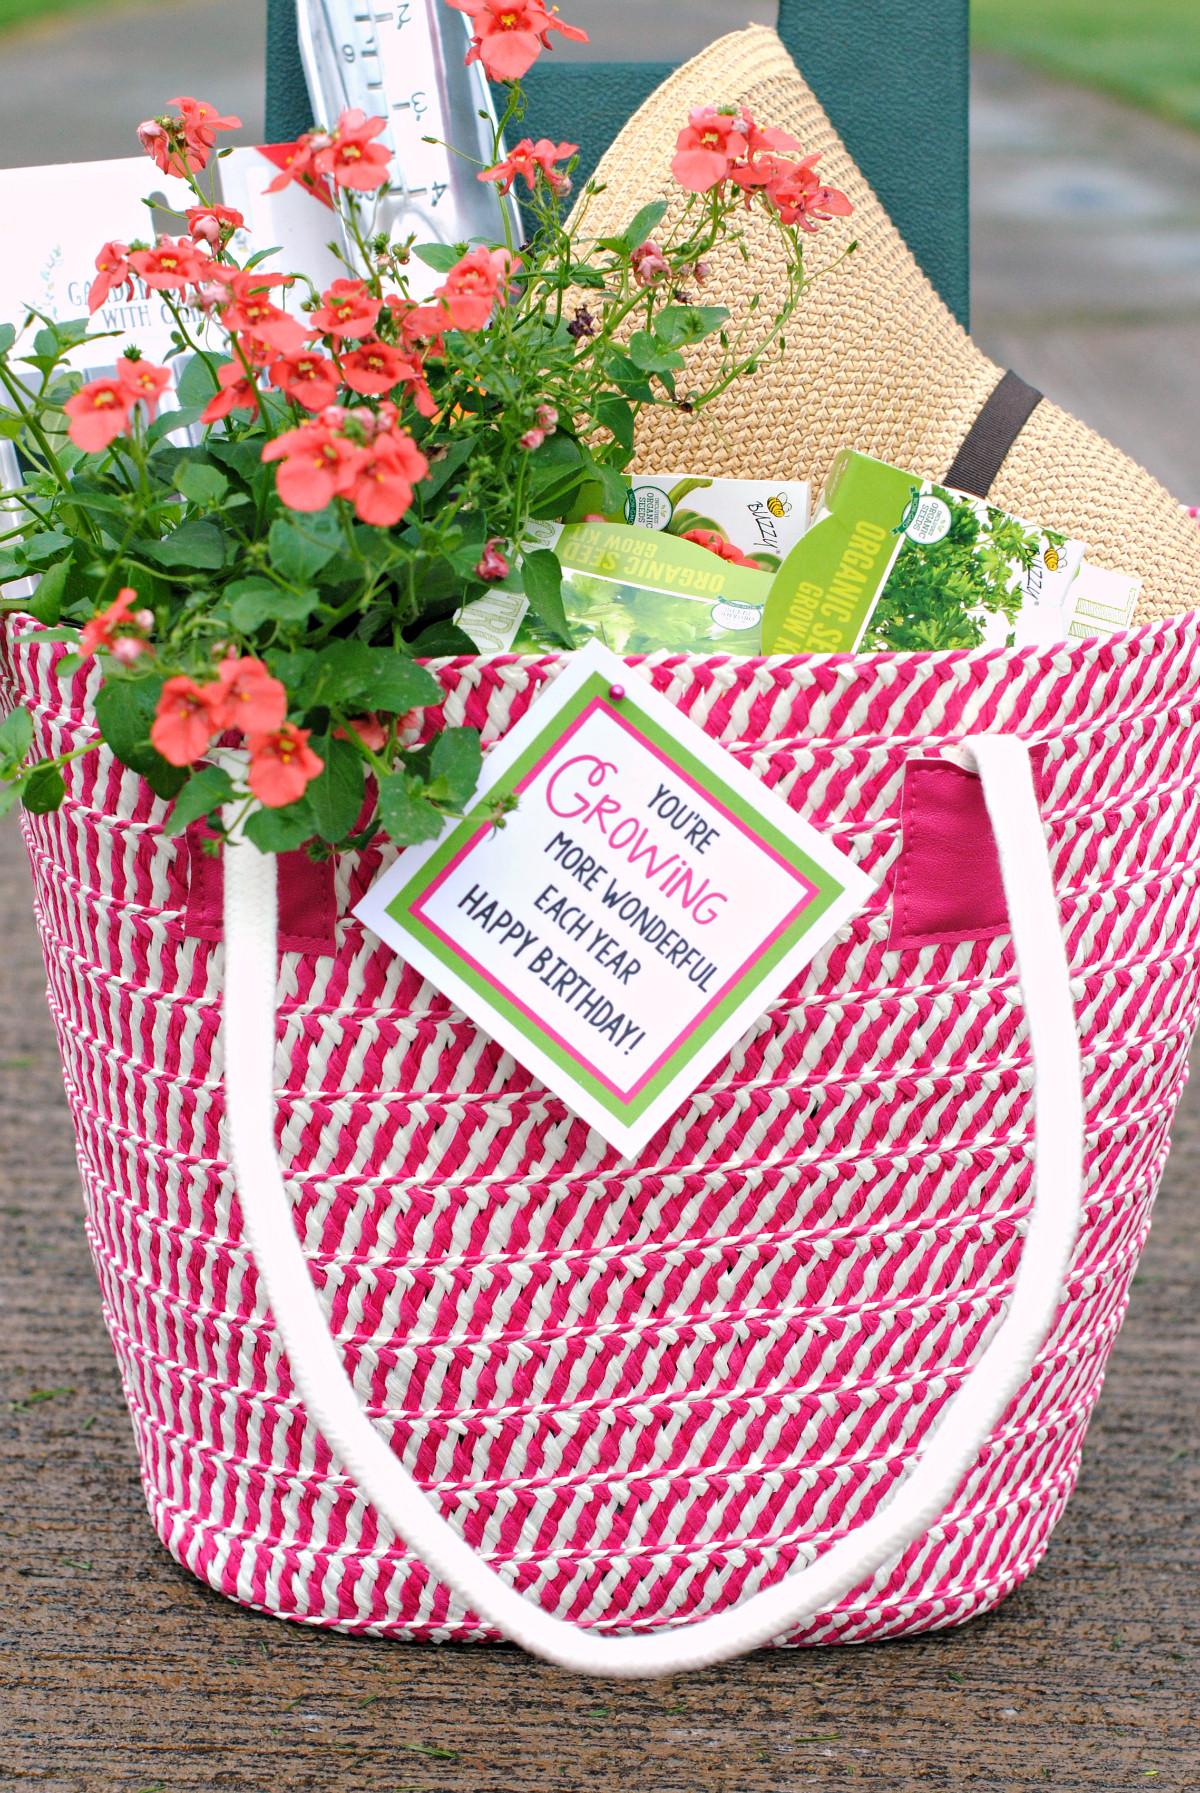 Gift Basket Ideas For Friends Birthday  Creative Birthday Gifts for Friends – Fun Squared